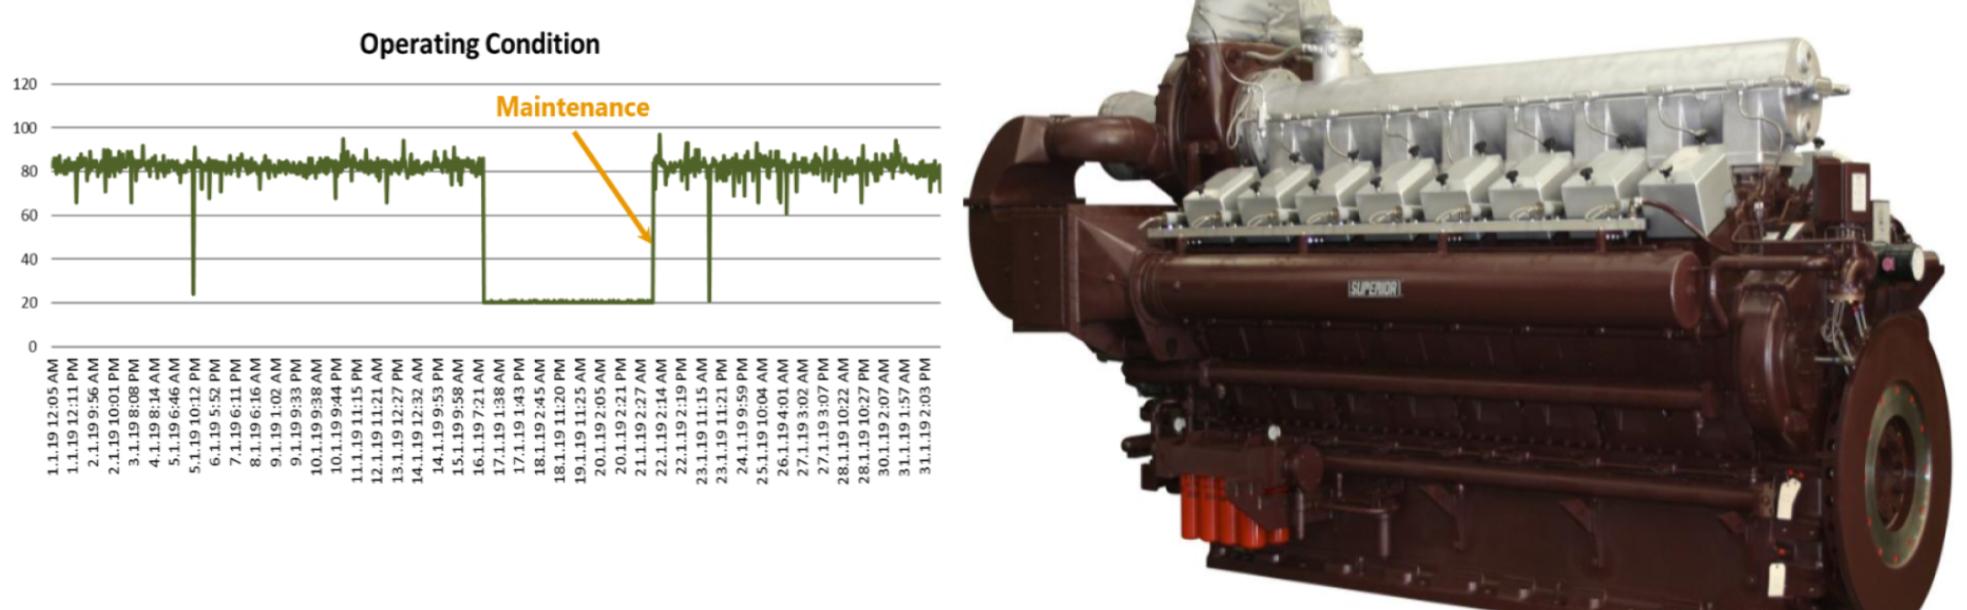 Misfiring on Gas Engines